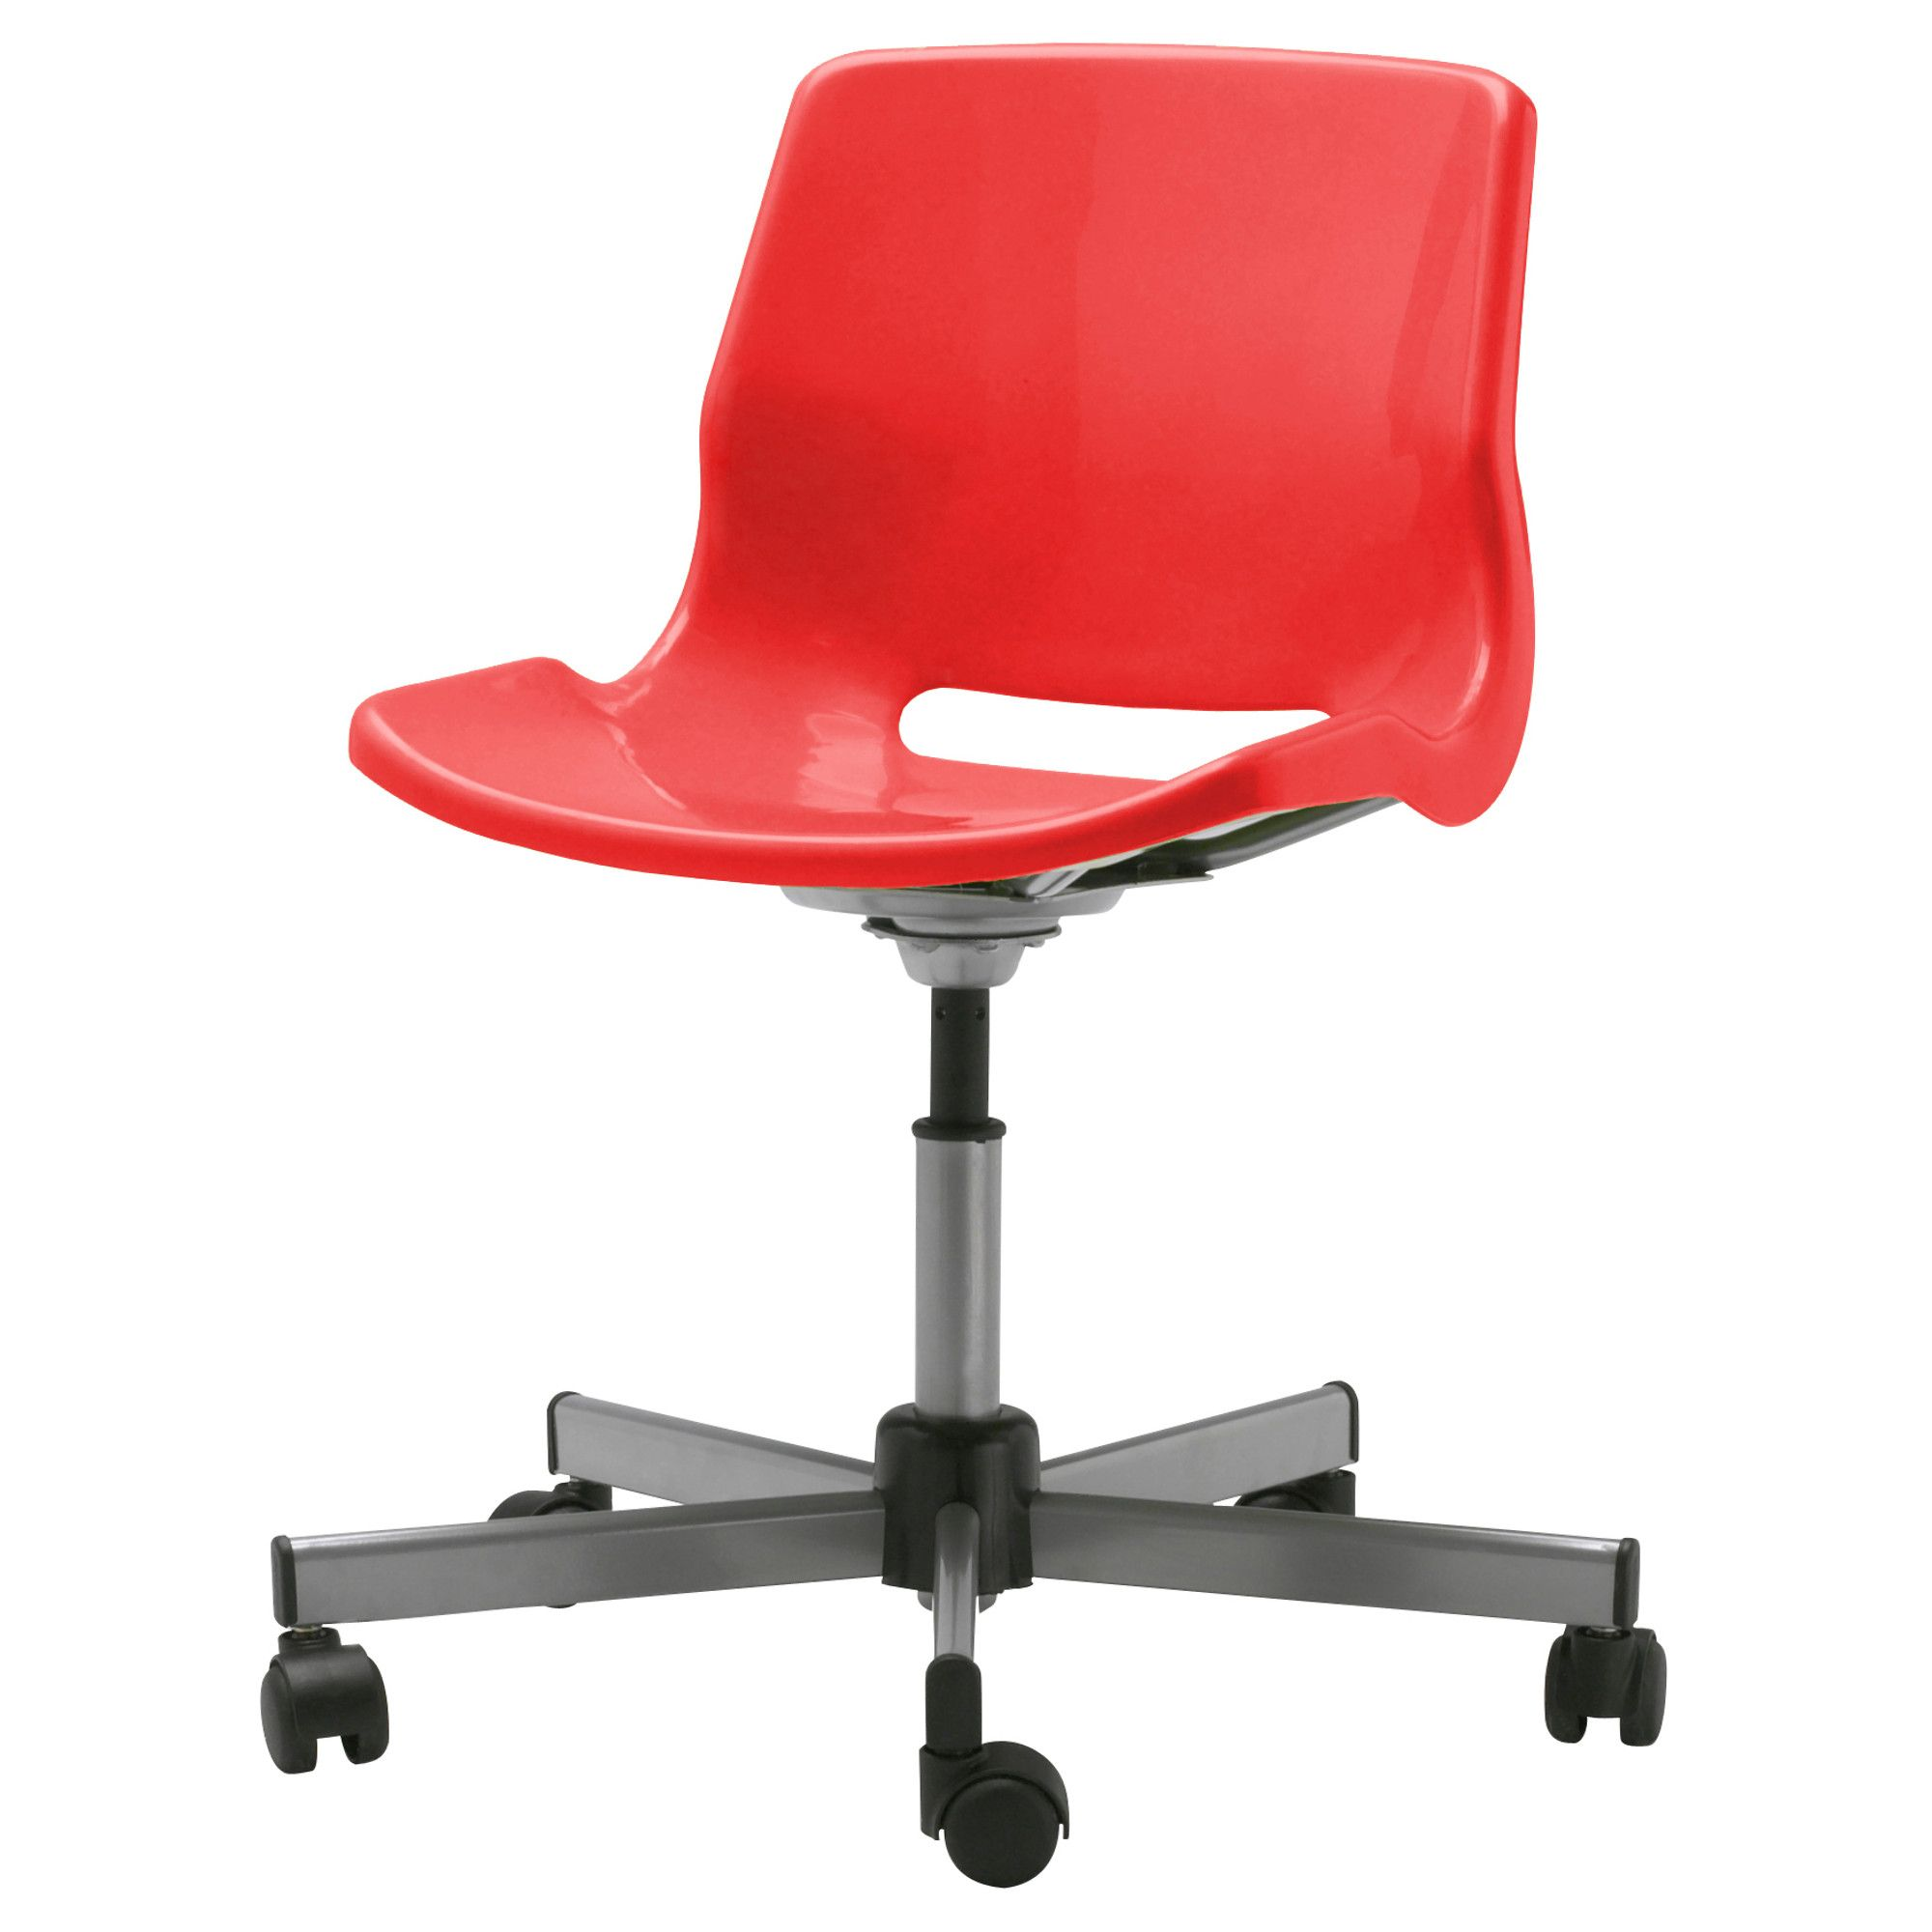 Ikea Us Furniture And Home Furnishings Ikea Chair Ikea